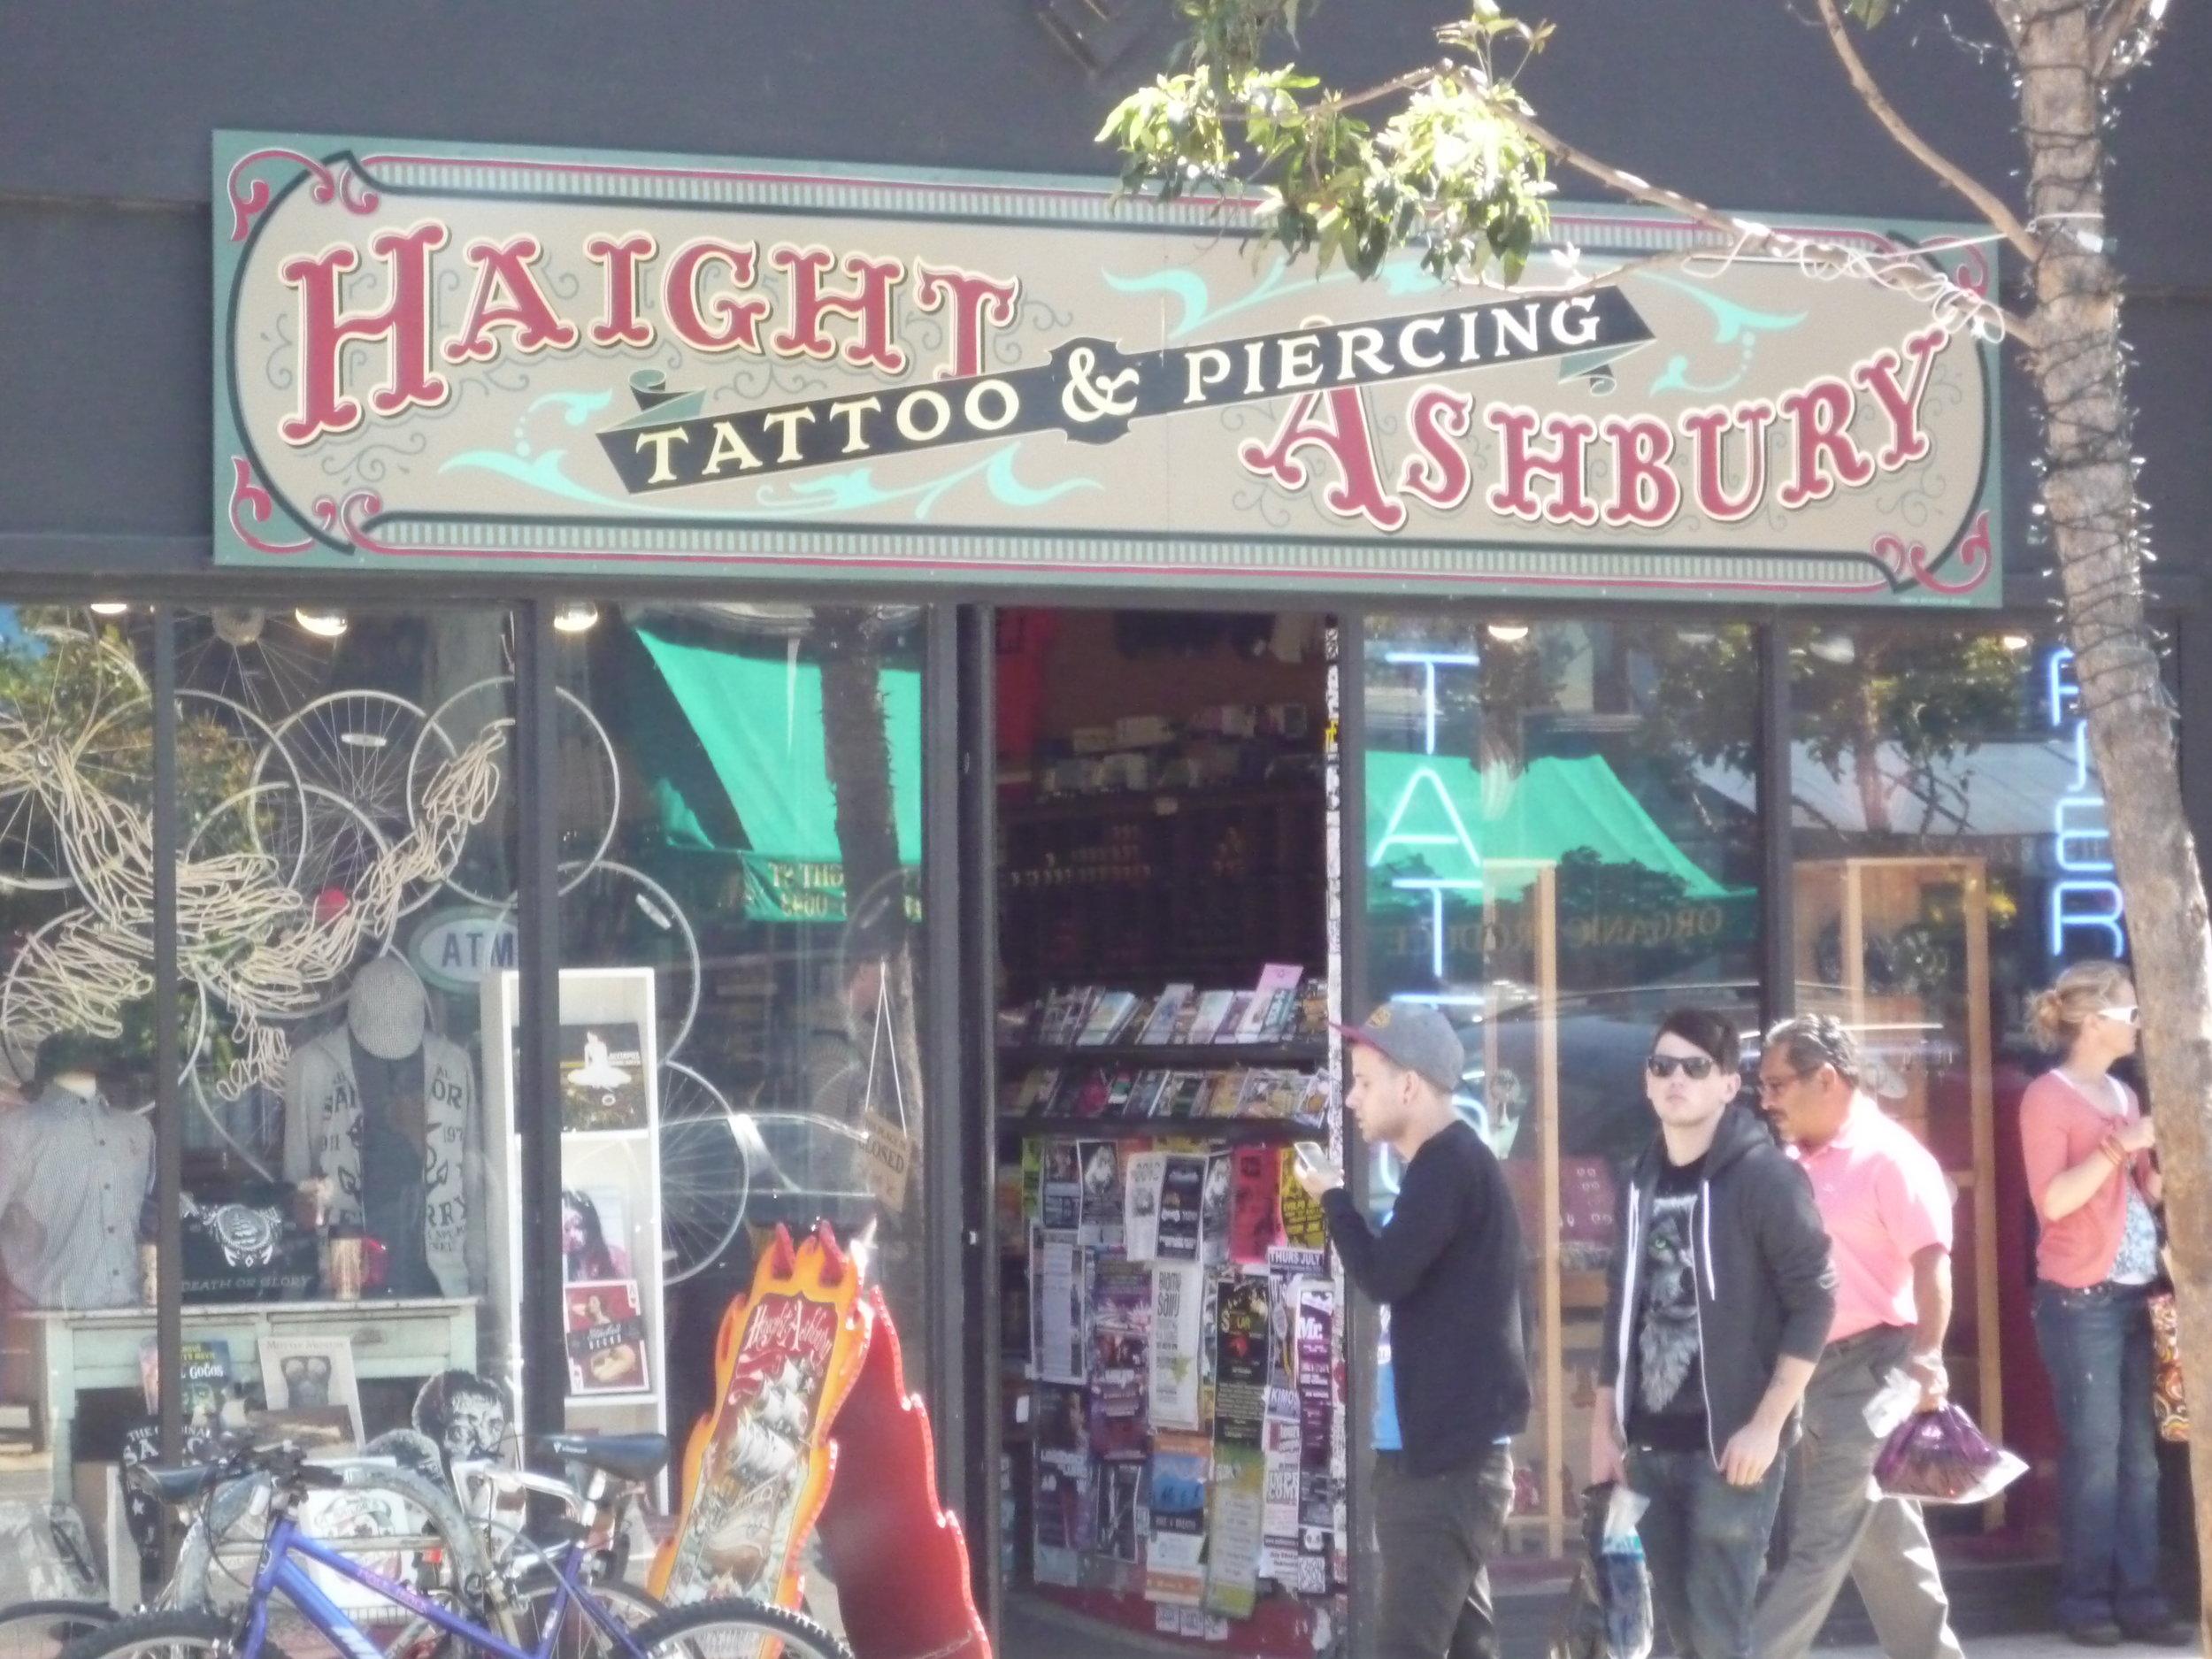 ORIG-haight-ashbury-tattoo_5878414991_o.jpg